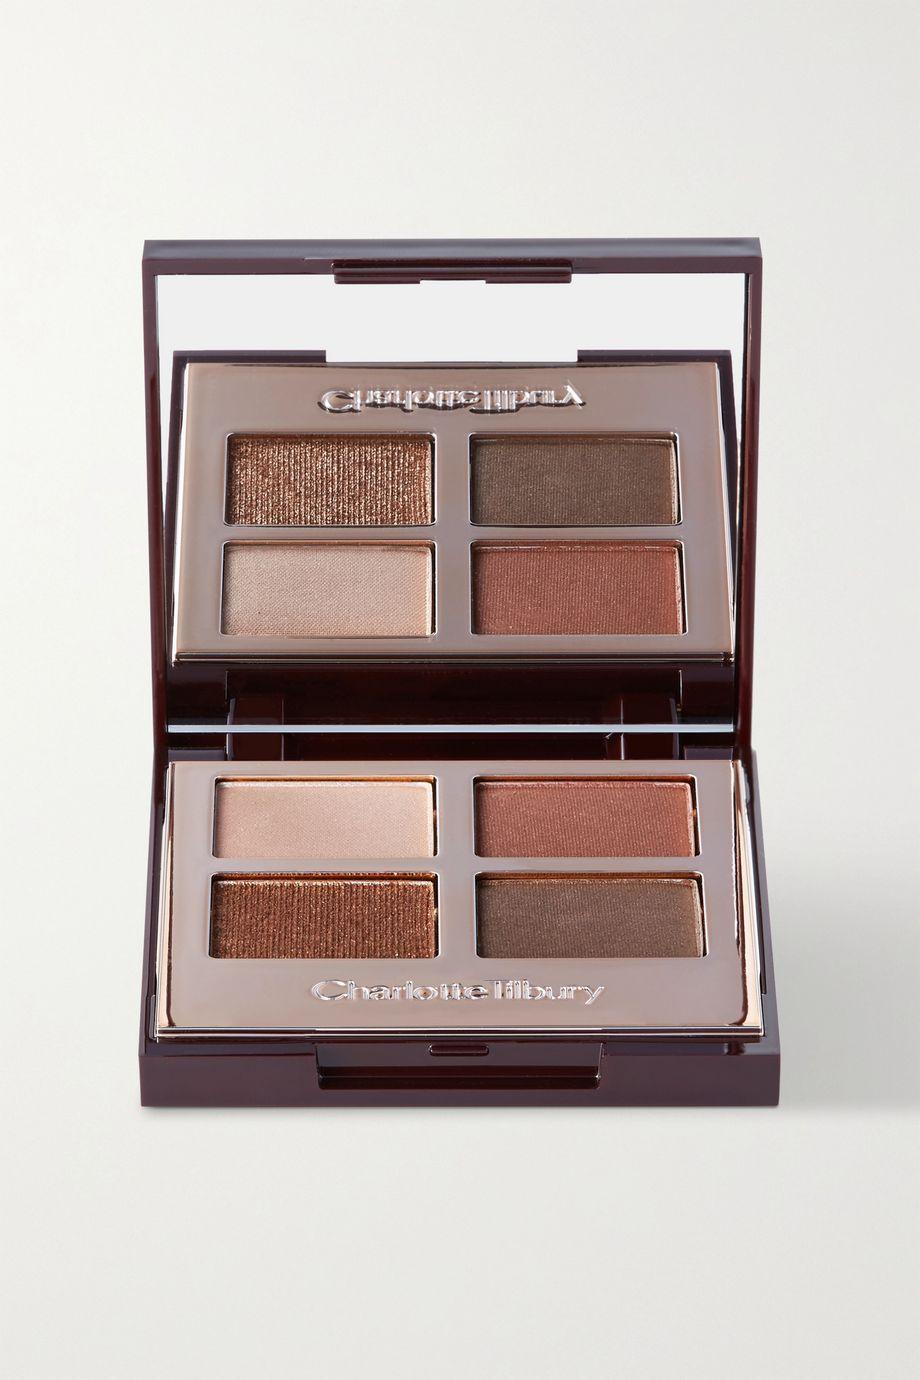 Charlotte Tilbury Luxury Palette Colour Coded Eye Shadow - Bella Sofia